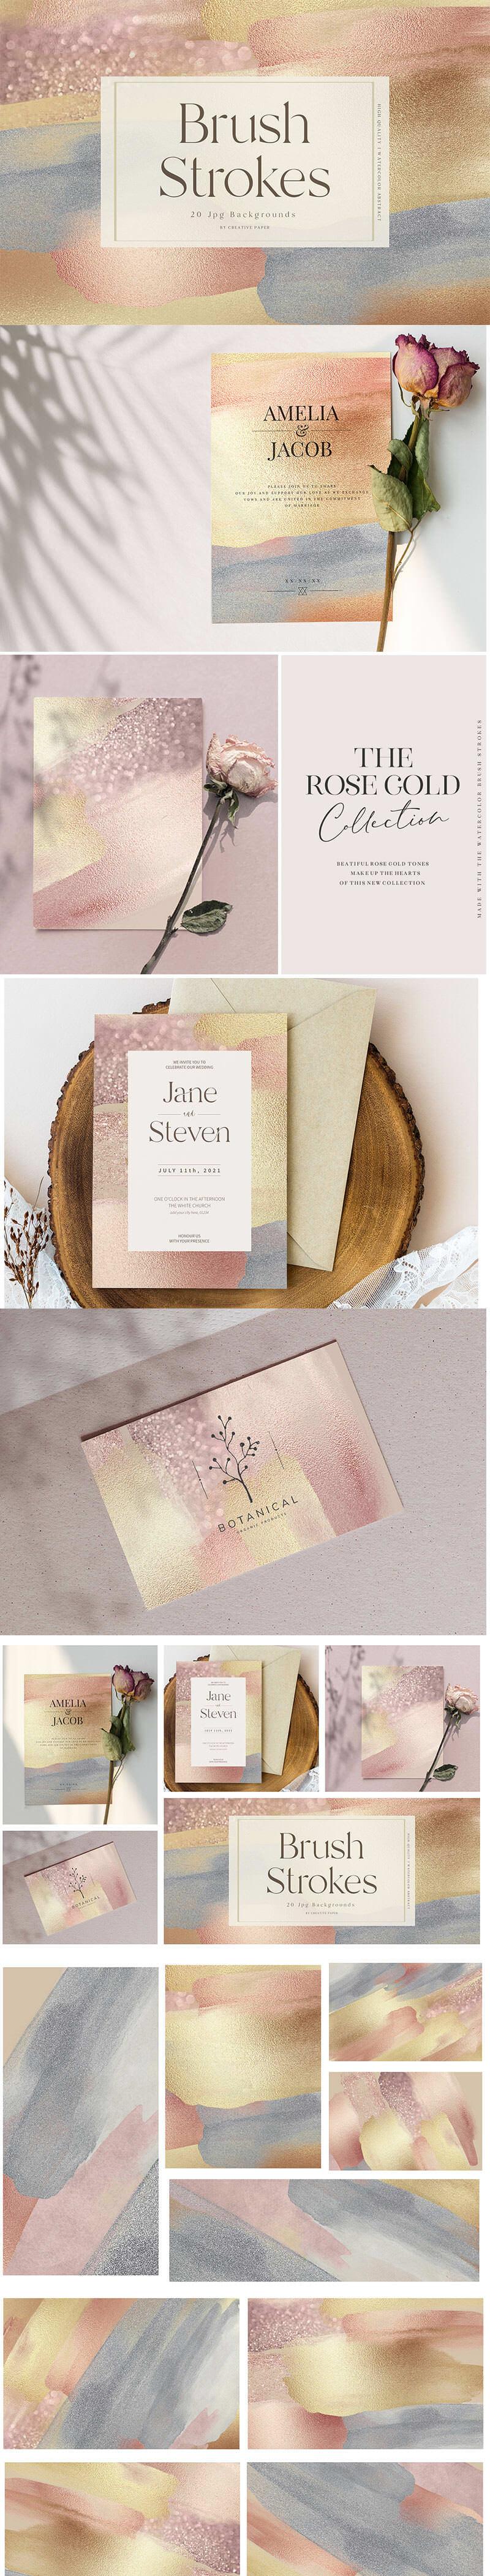 Brush-Strokes-Rose-Gold-Backgrounds-1-(1)